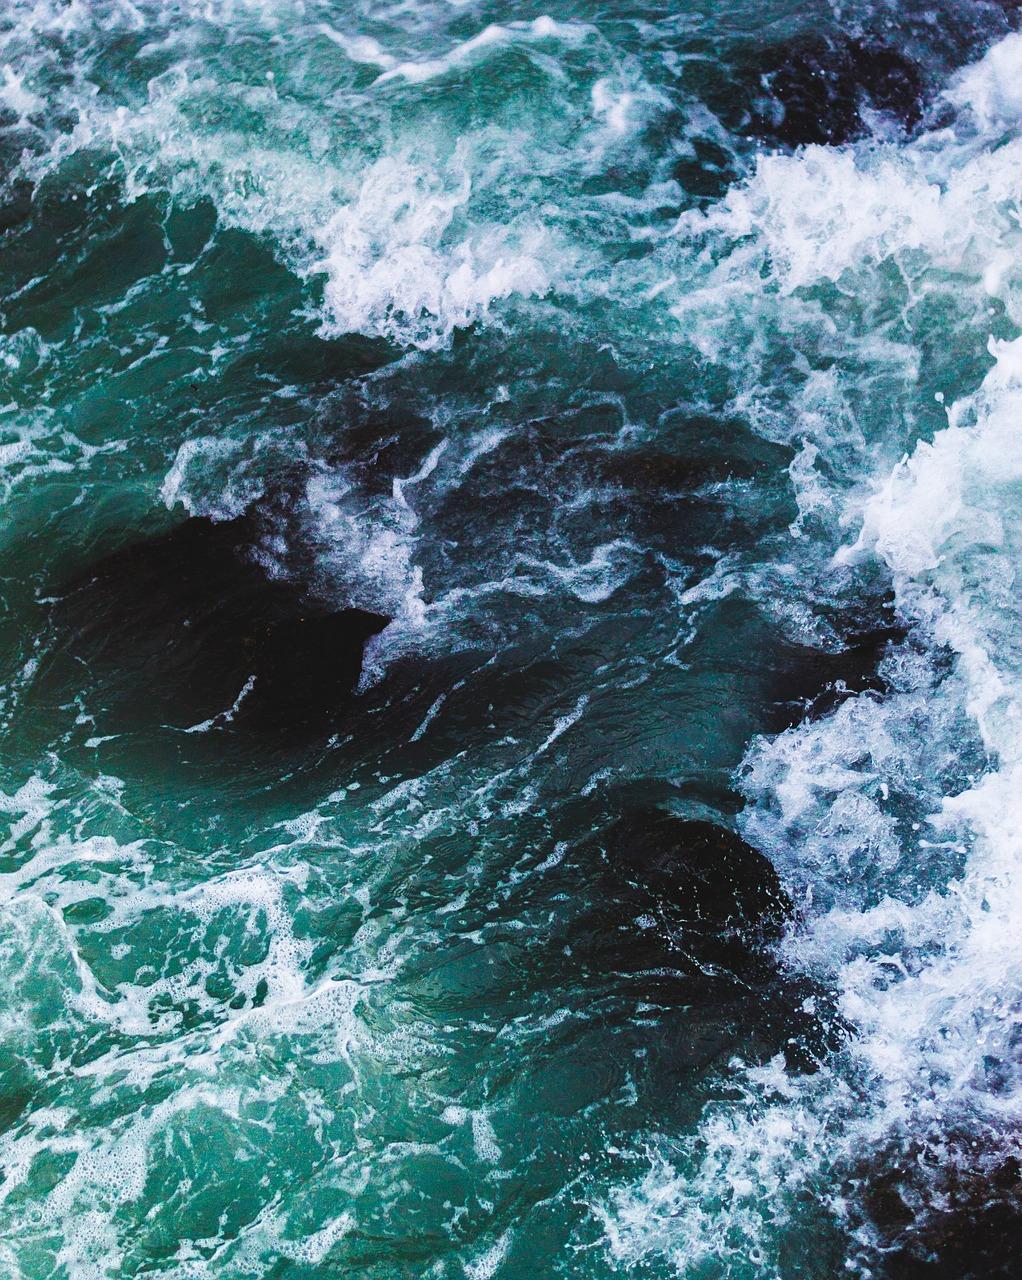 seascape-1031583_1280.jpg